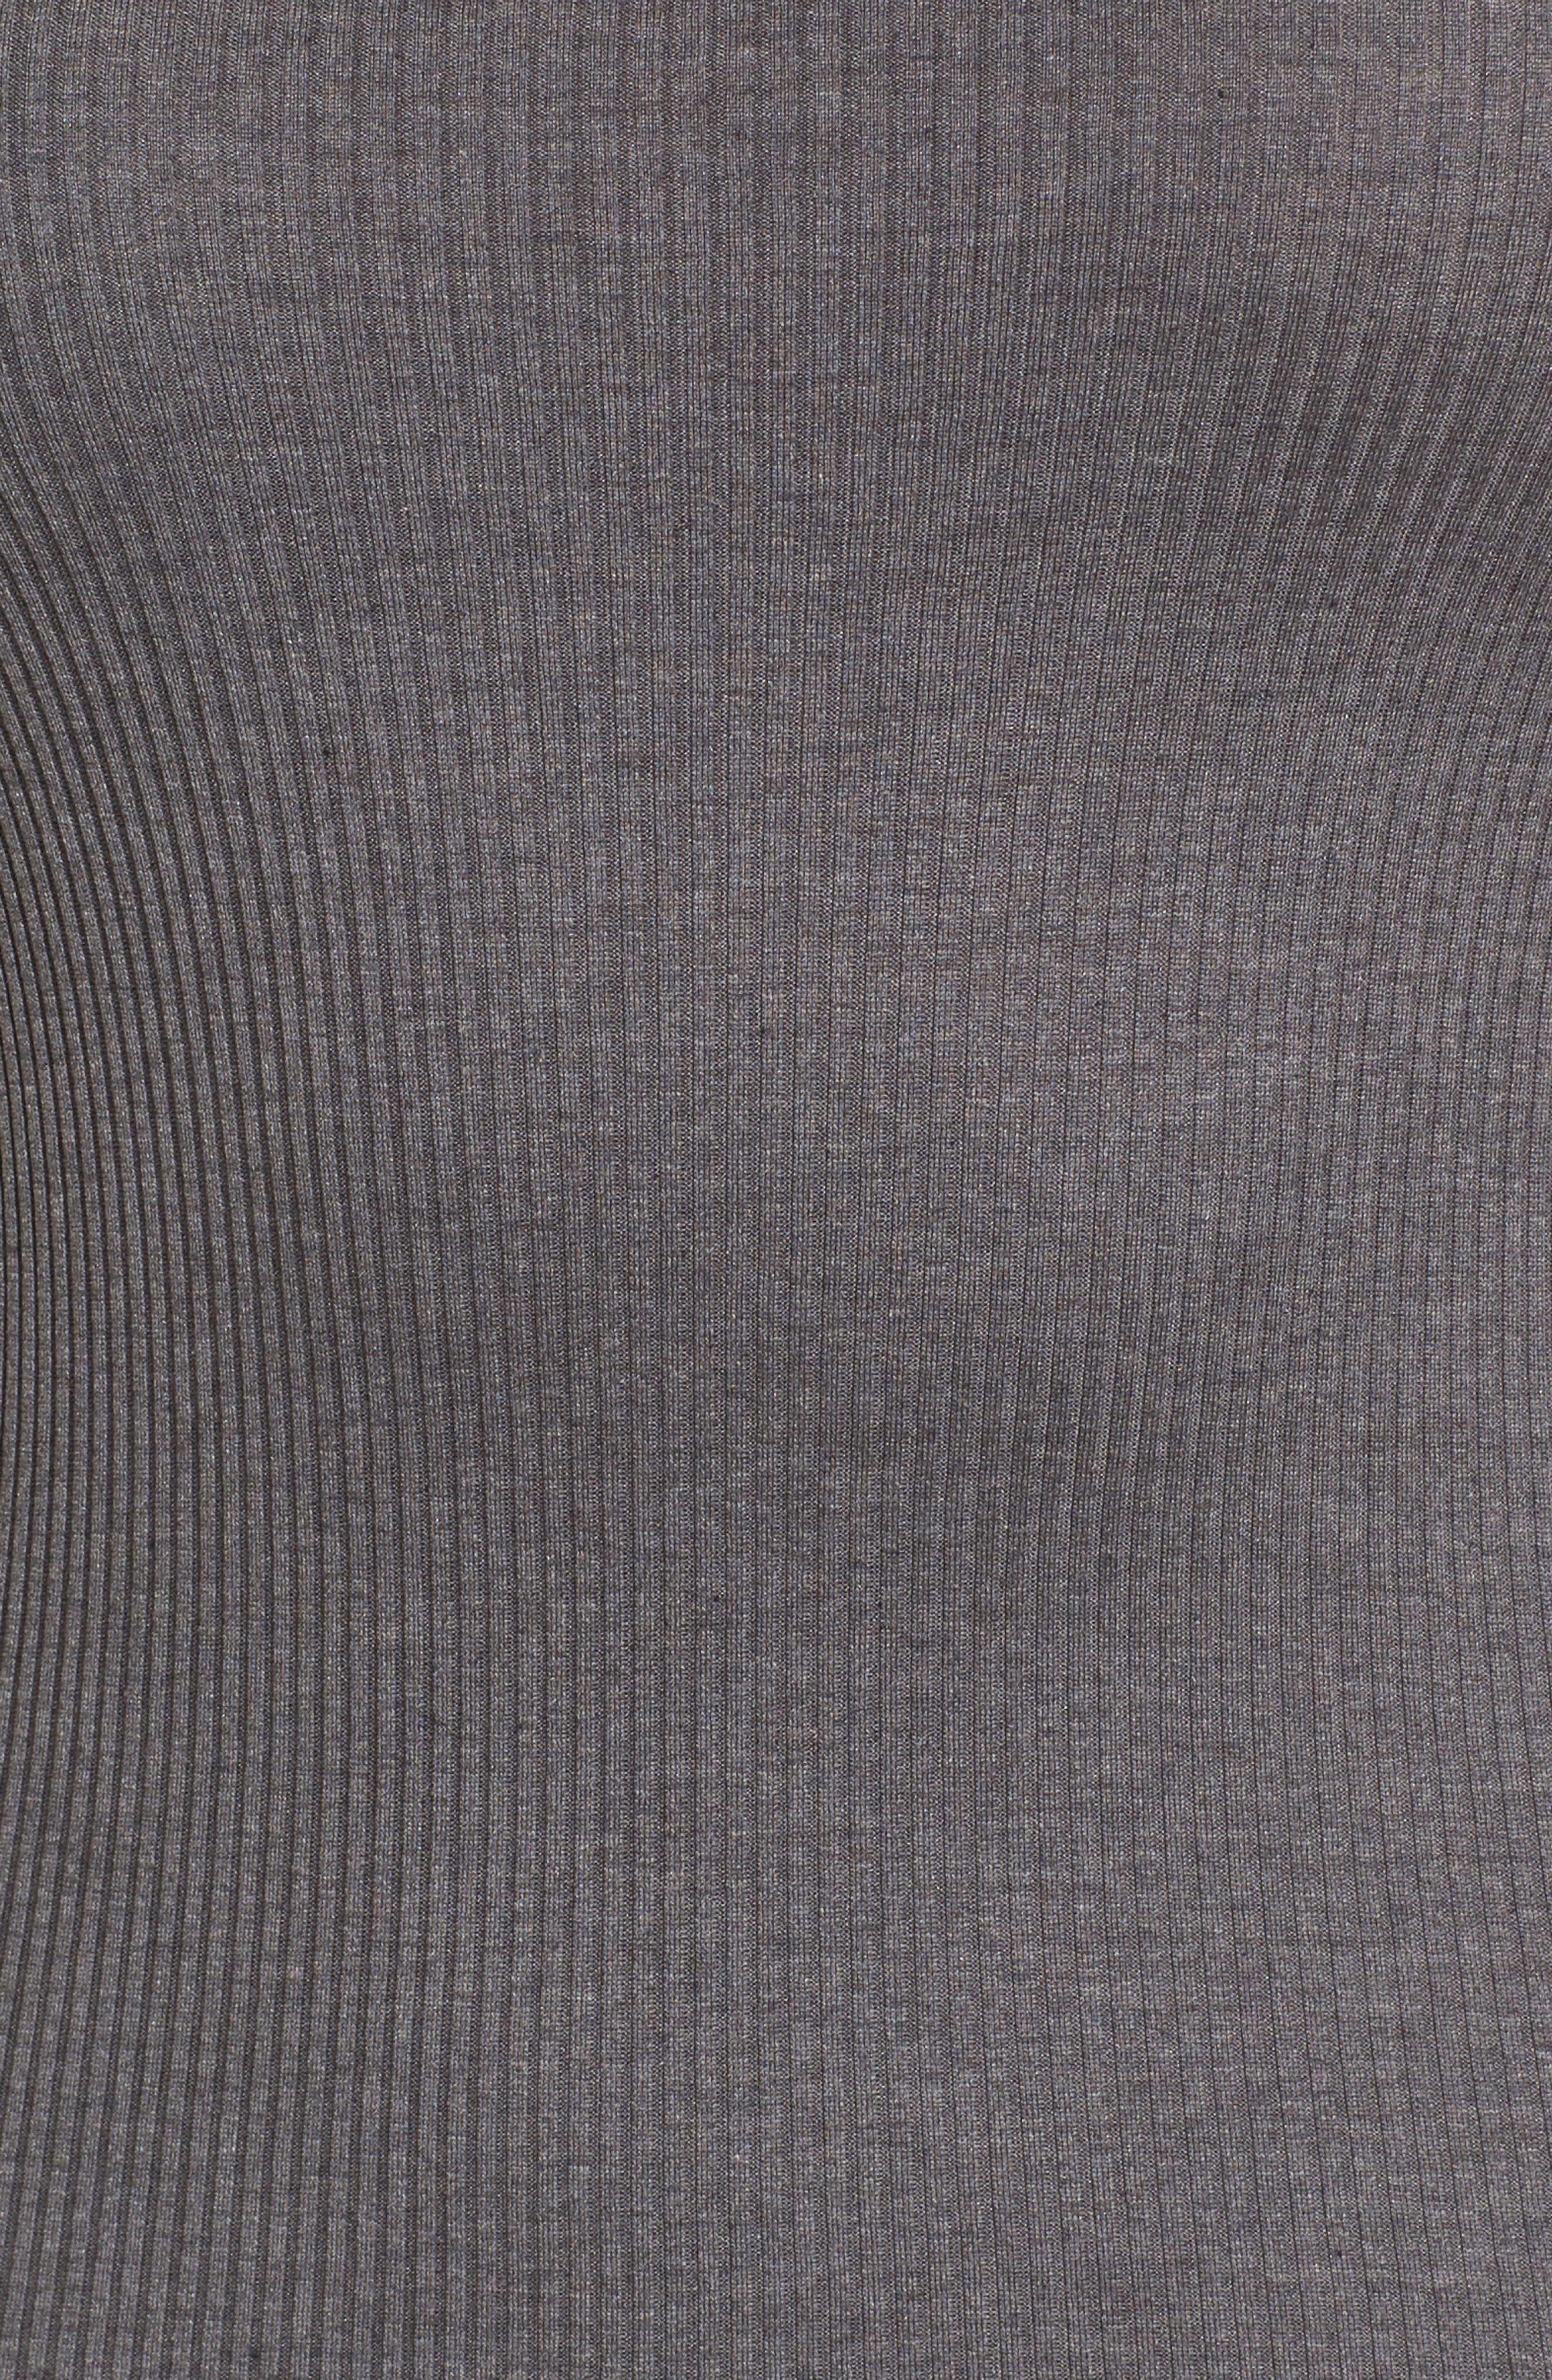 ROSEMUNDE, Silk & Cotton Rib Knit Tank, Alternate thumbnail 6, color, DARK GREY